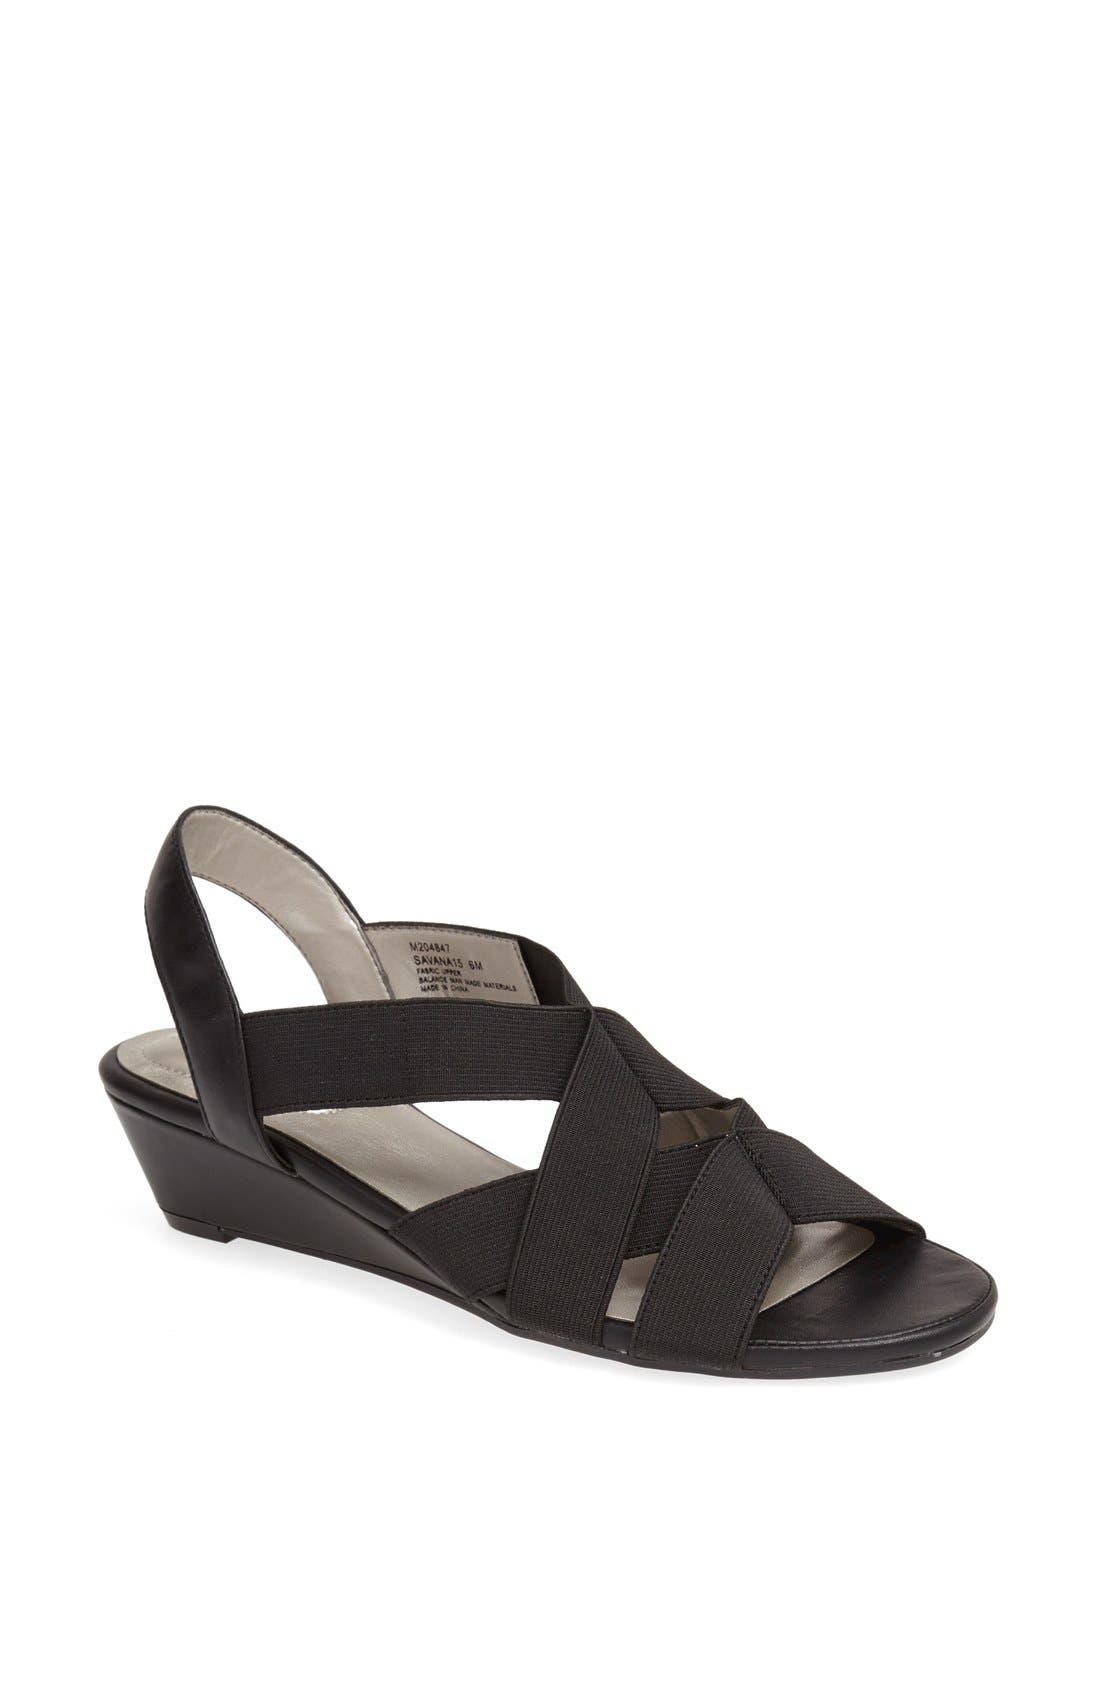 Main Image - Me Too 'Savana' Sandal